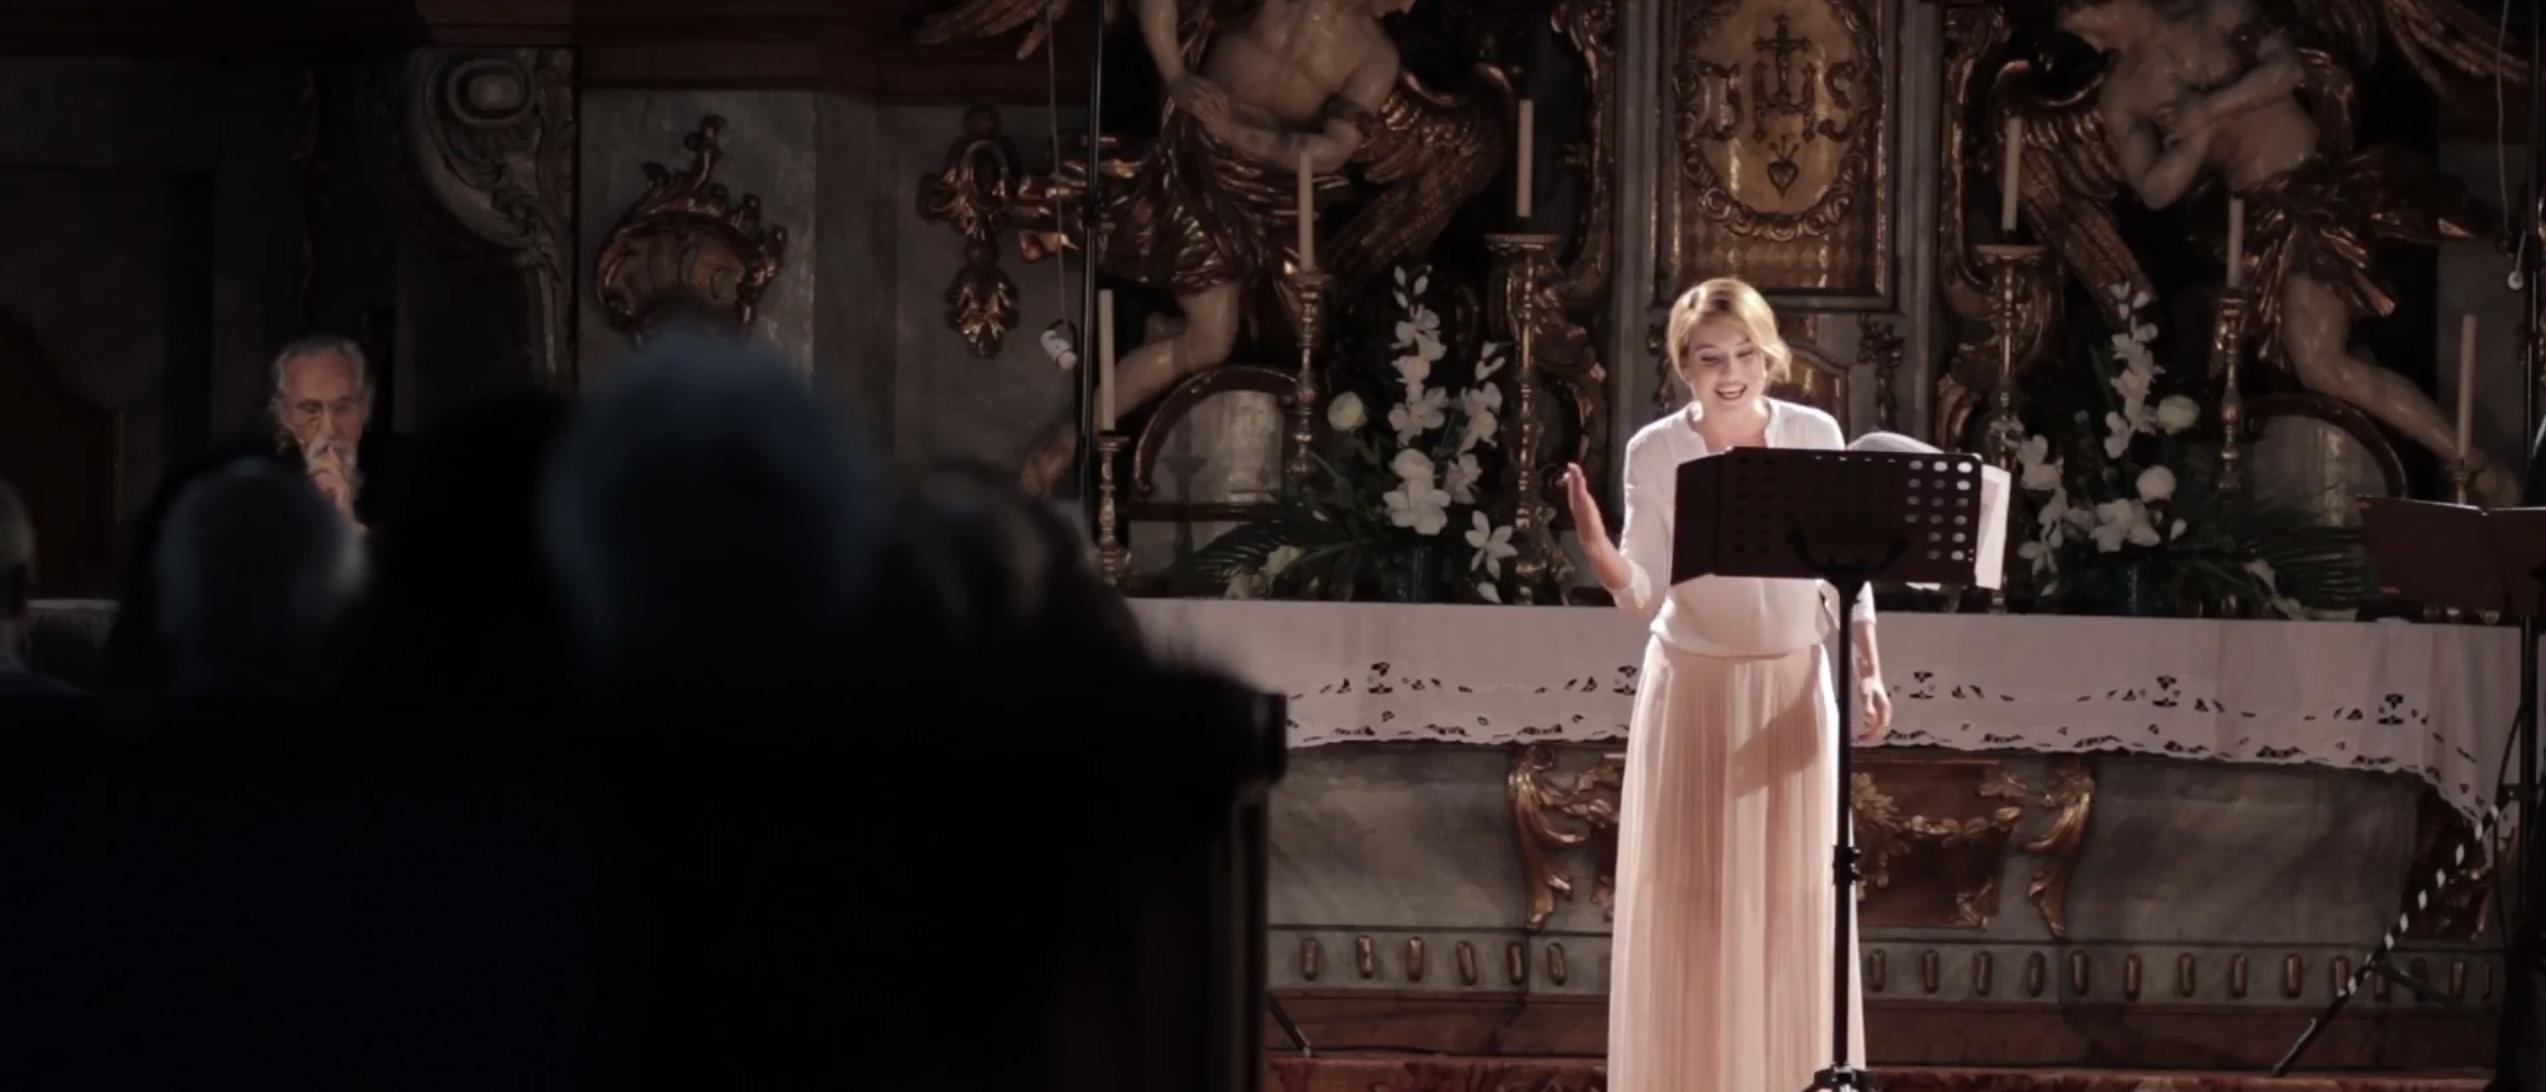 Pro-bono video produkcia a youtube kampaň pre festival Capalest